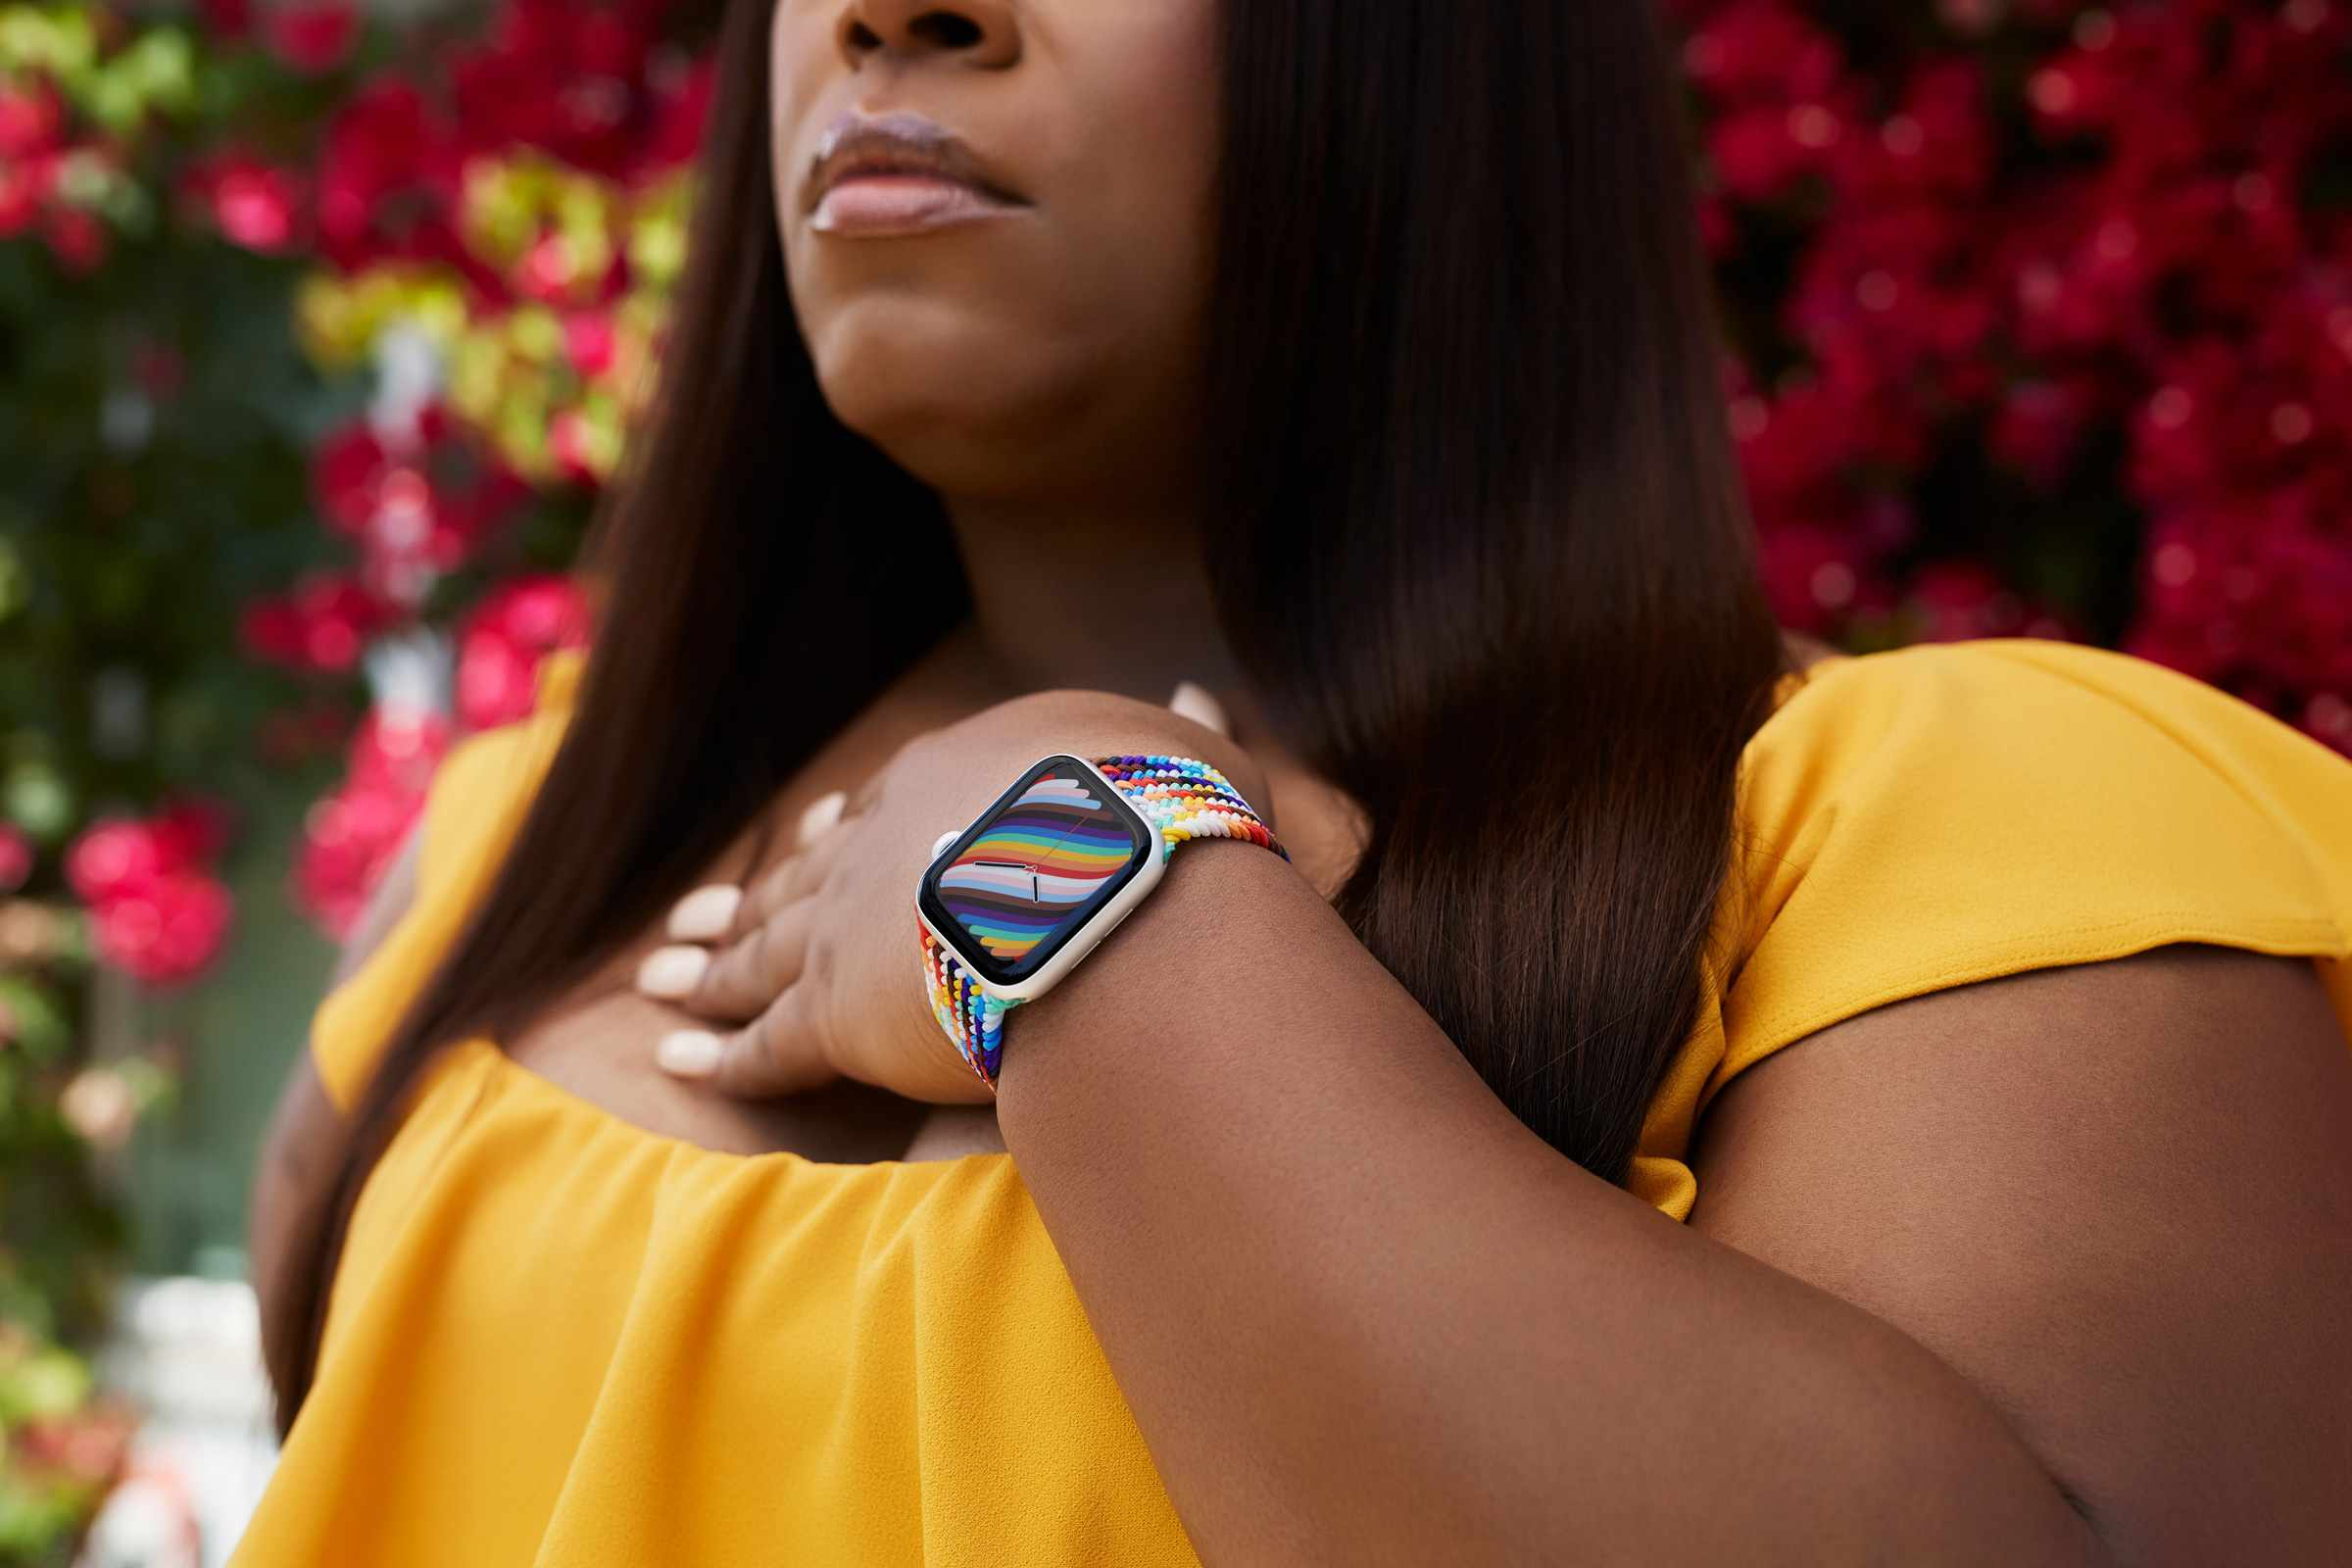 Apple Watch Pride Edition Braided Solo Loop